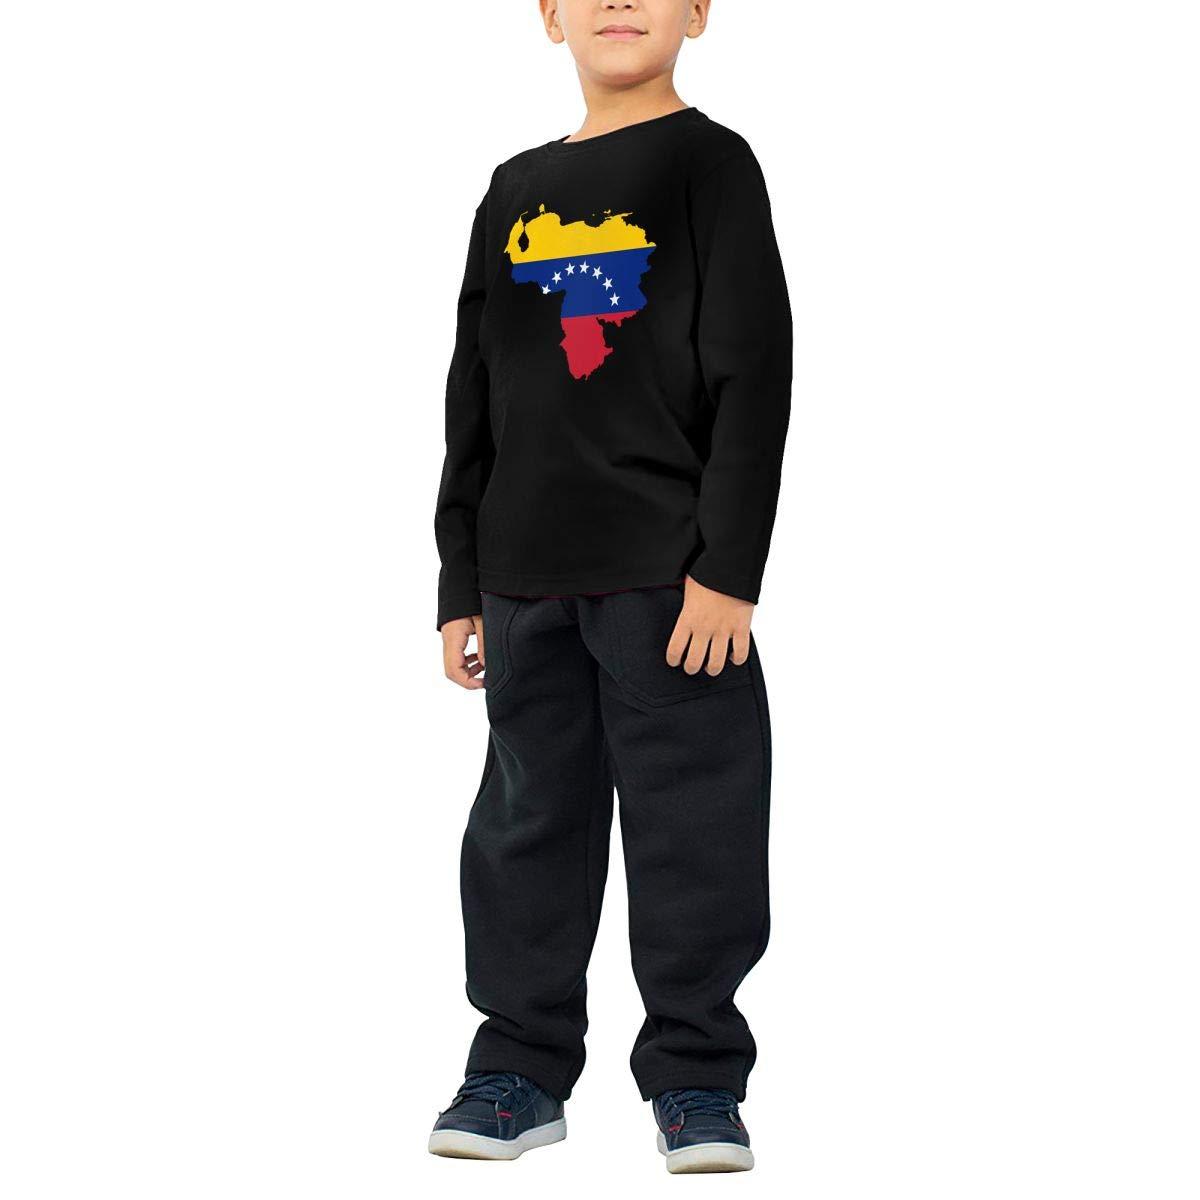 CERTONGCXTS Childrens Venezuela Map Flag ComfortSoft Long Sleeve Shirt